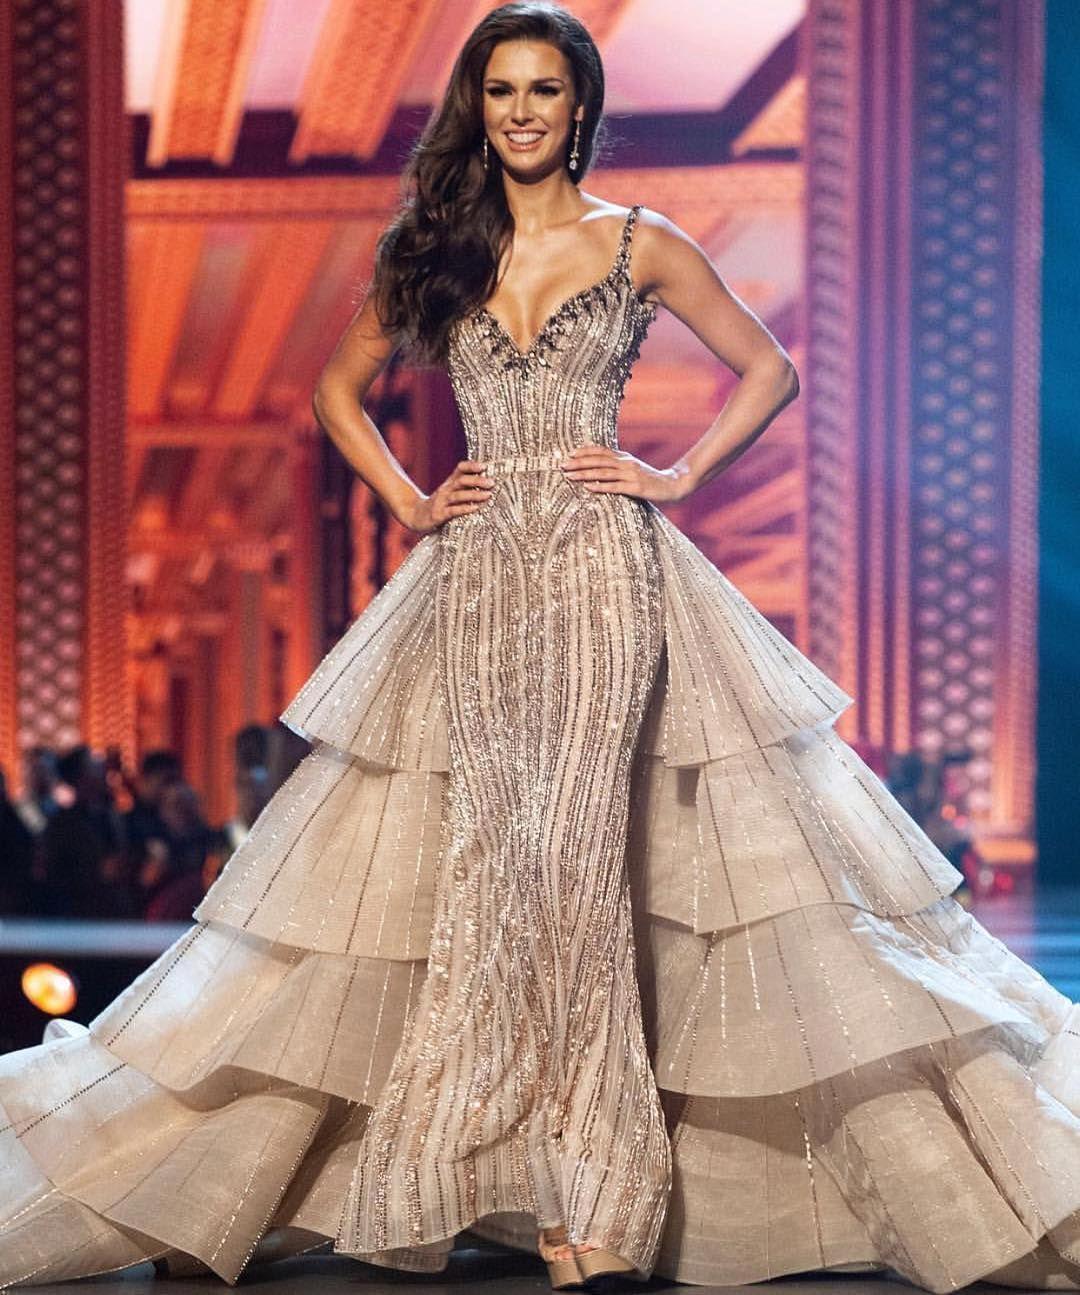 women's beauty pageant dresses